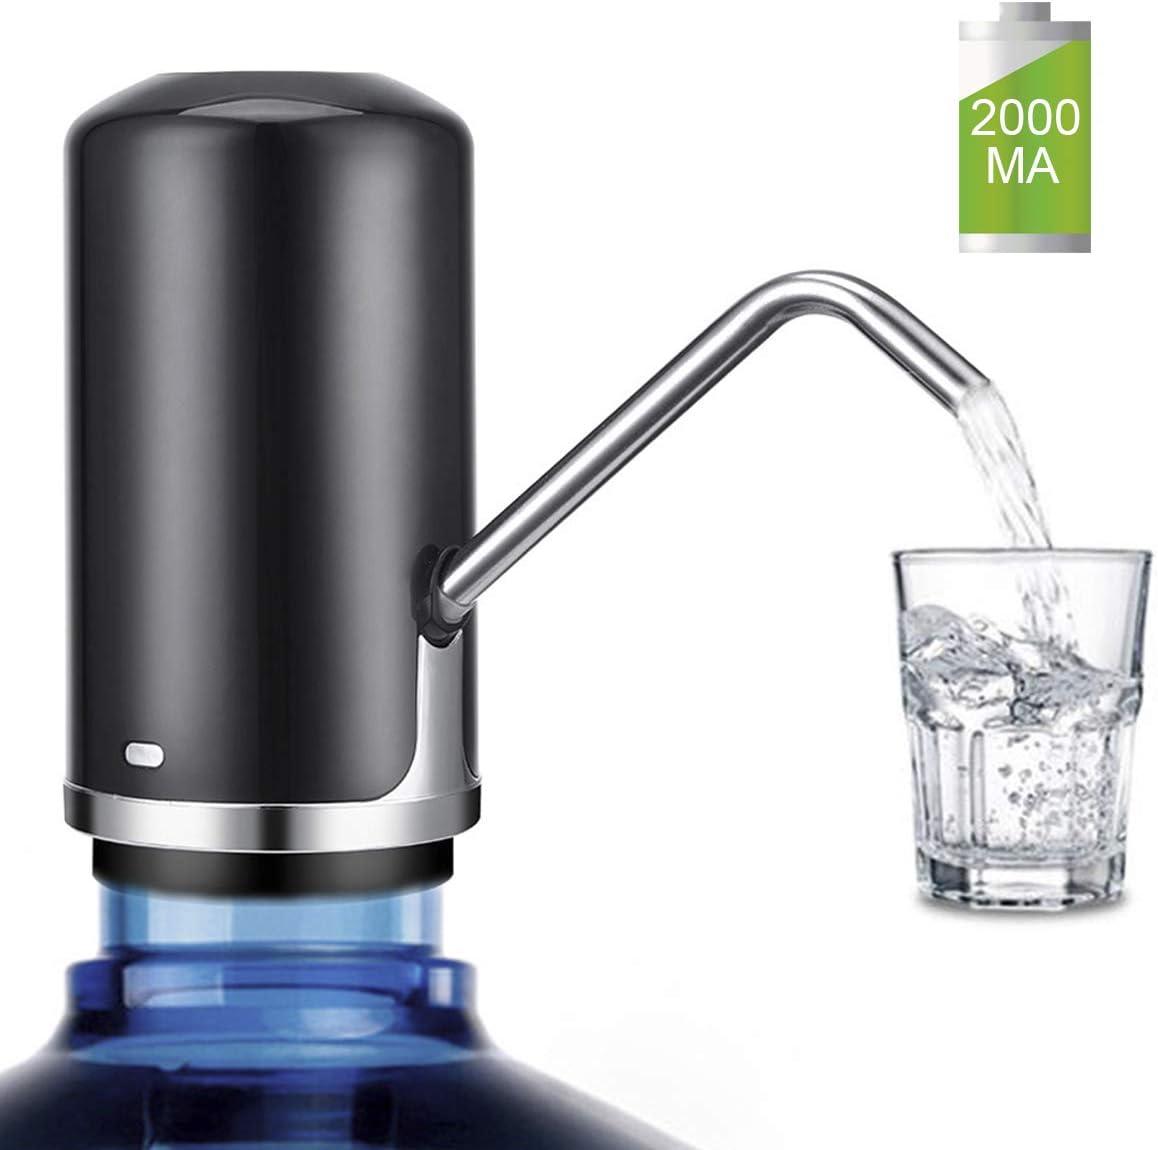 Water Bottle Pump KOMAKE 5 Gallon Water Pump Dispenser USB Charging Electric Drinking Water Dispenser Portable Water Bottle Dispenser Switch for 2-5 Gallon